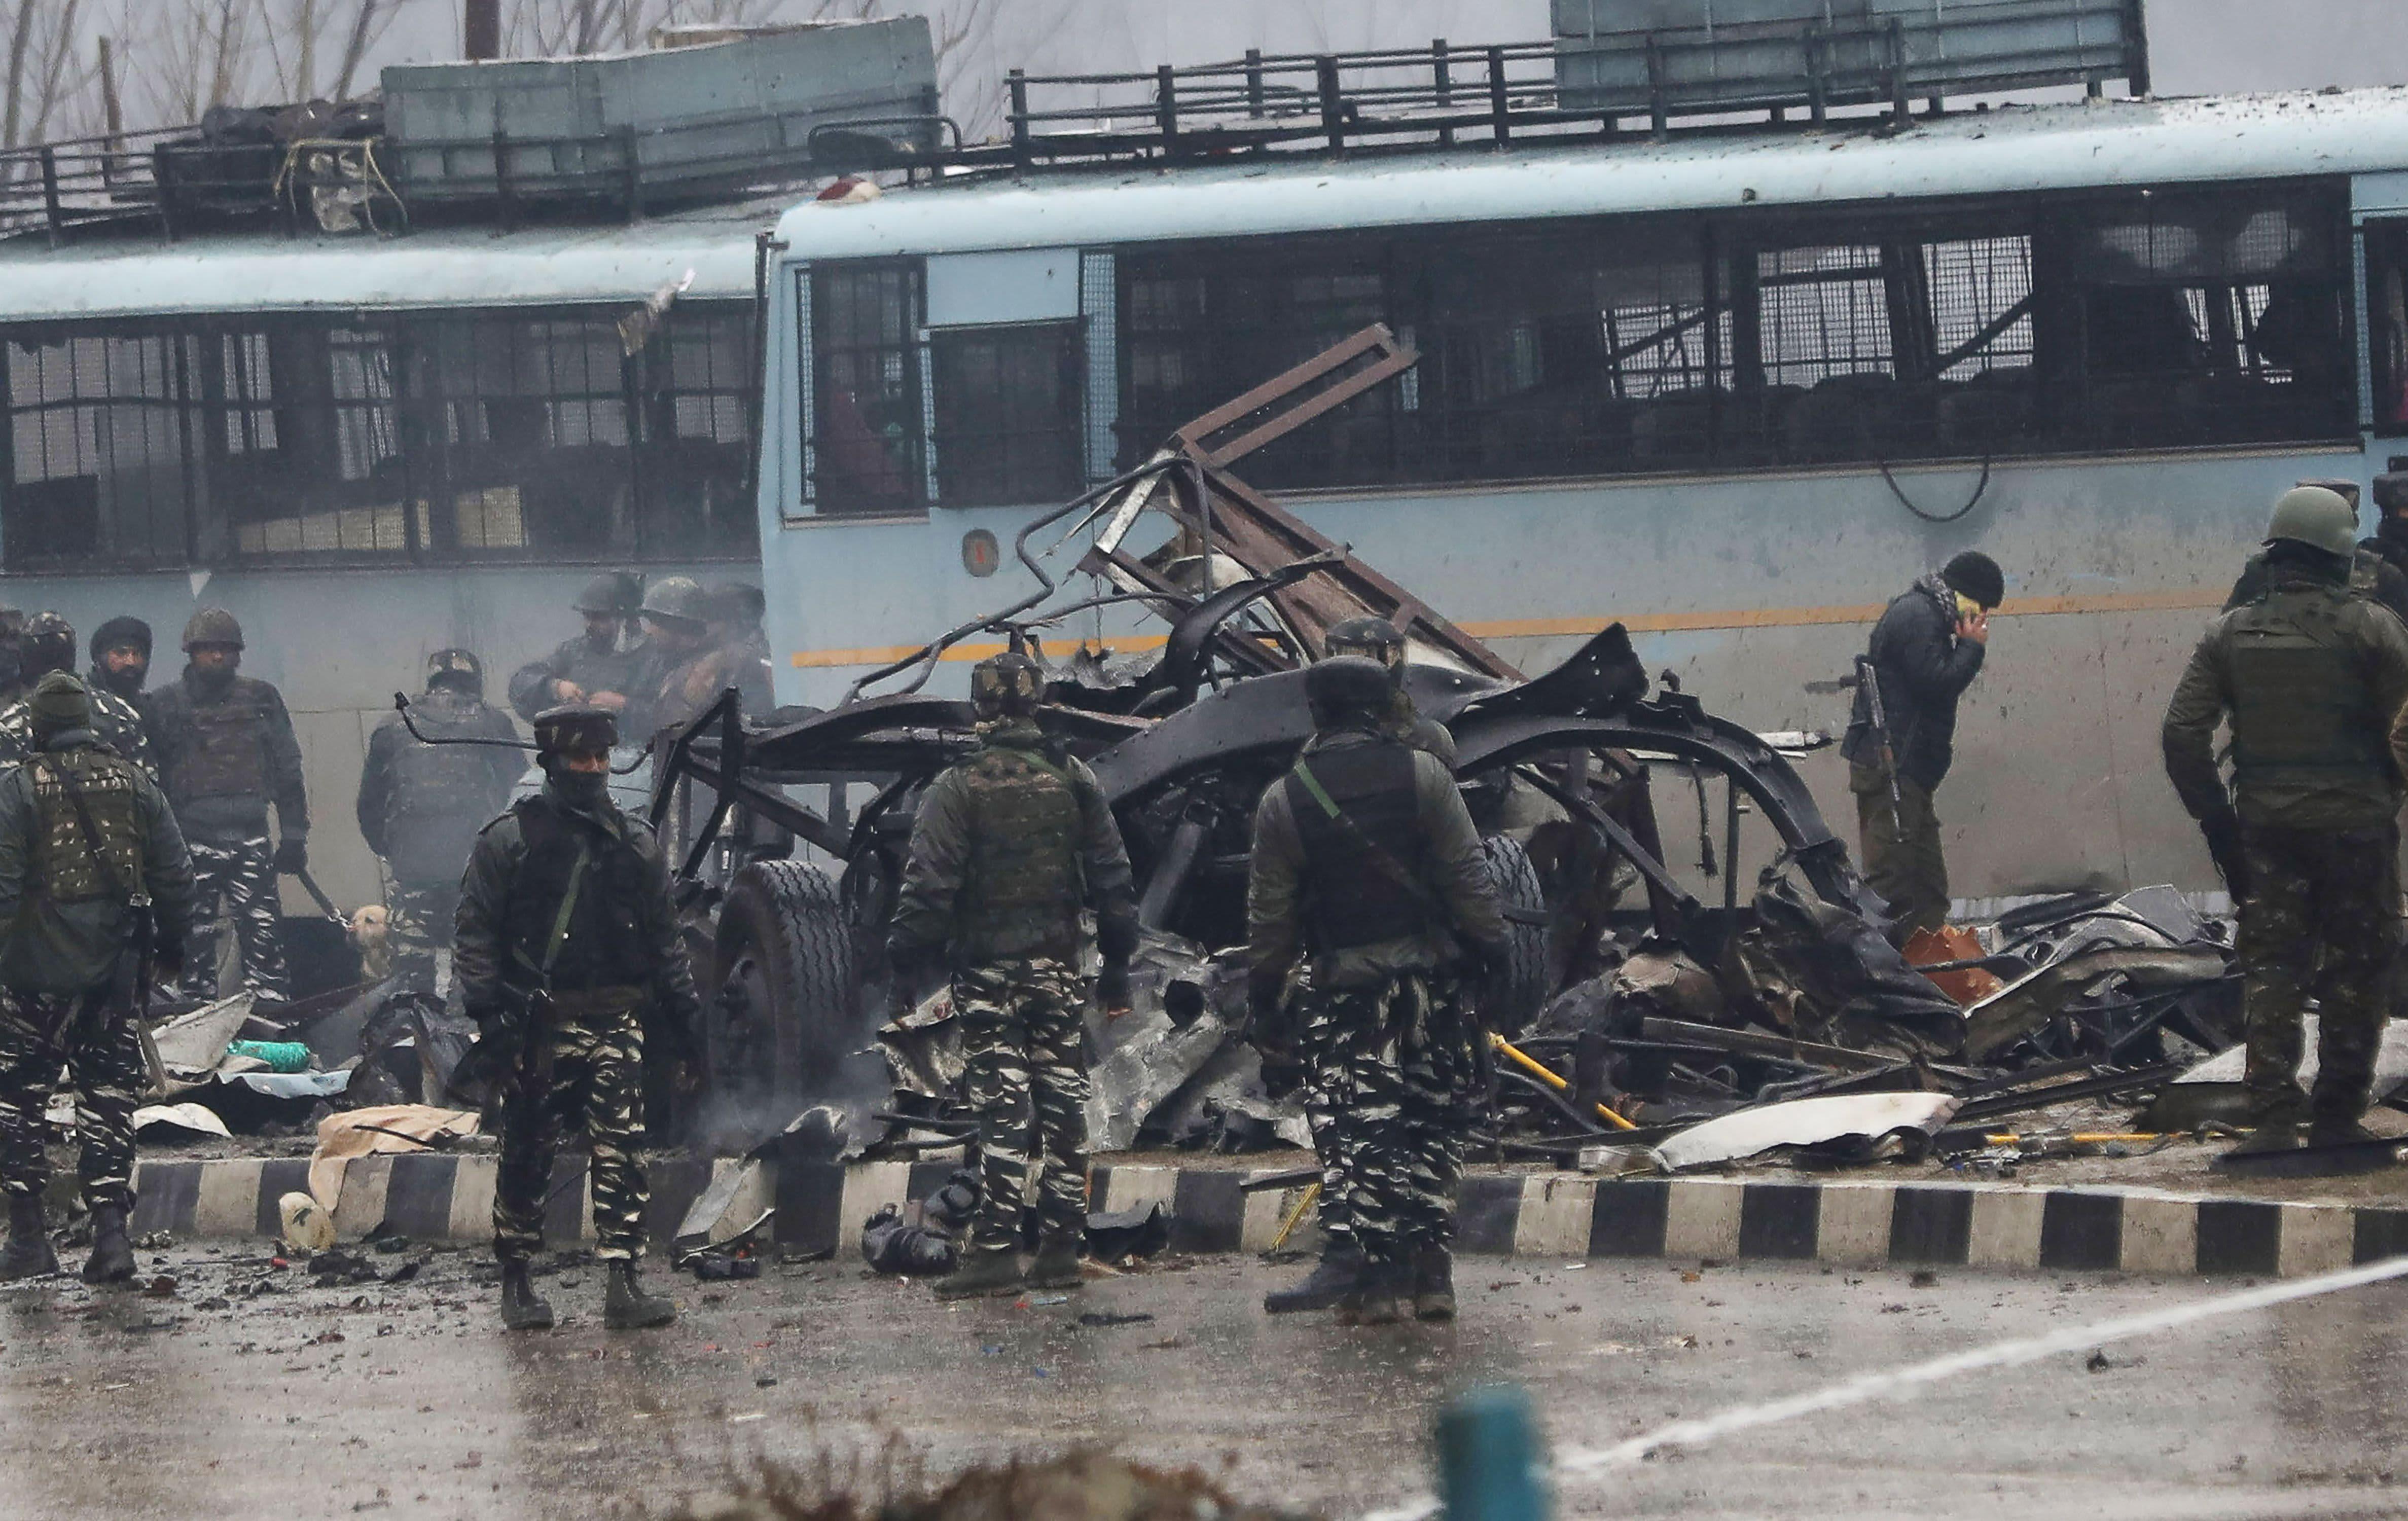 kashmir bomb kills 44; india demands pakistan act against militants